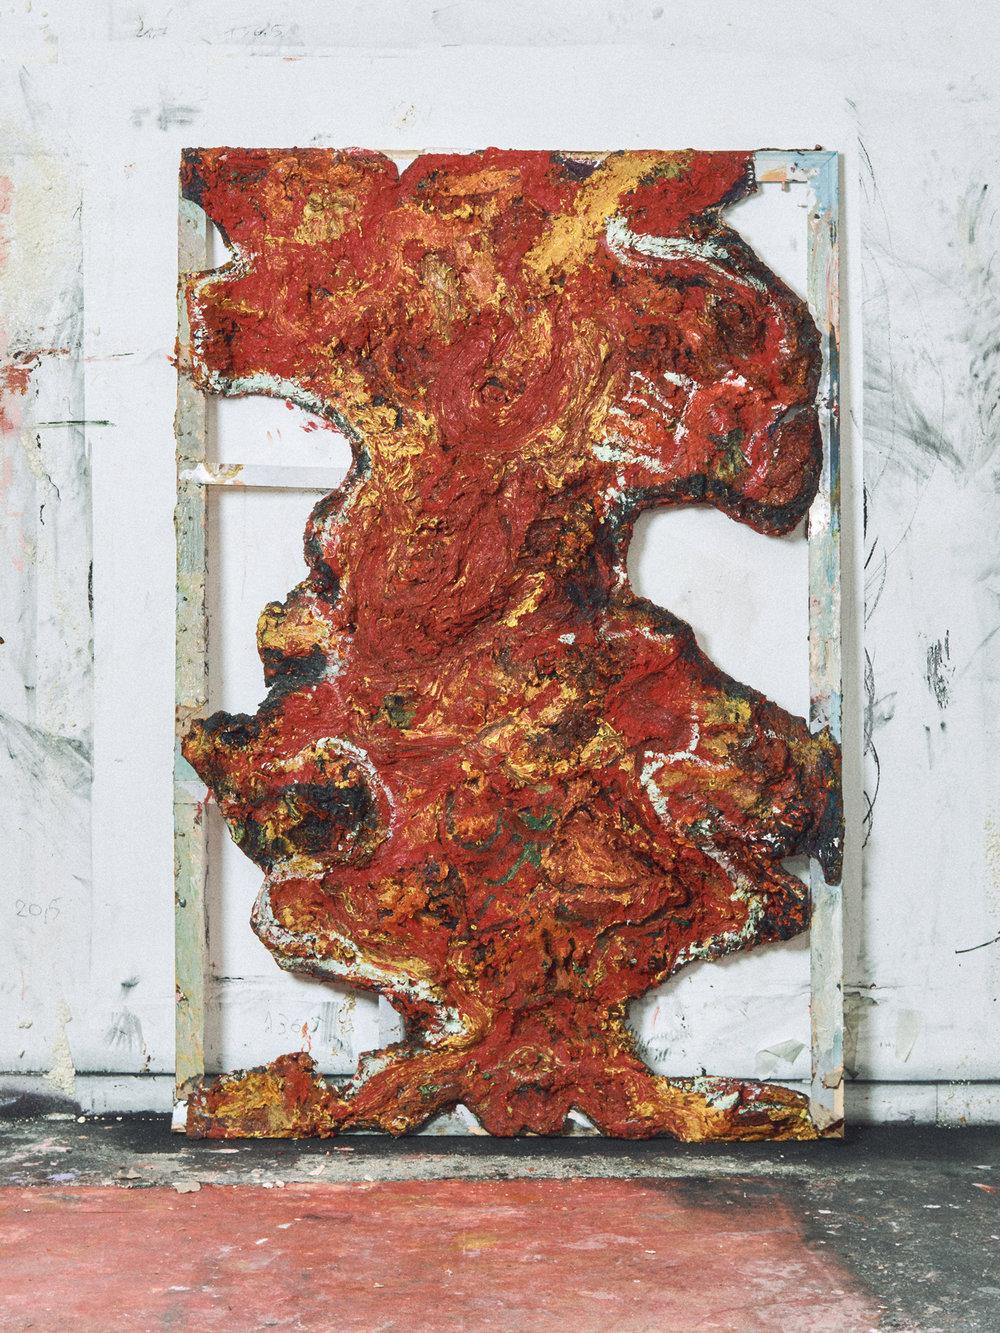 Double Demon, 2017/18 Oil on on canvas 215 x 140 x 6 cm